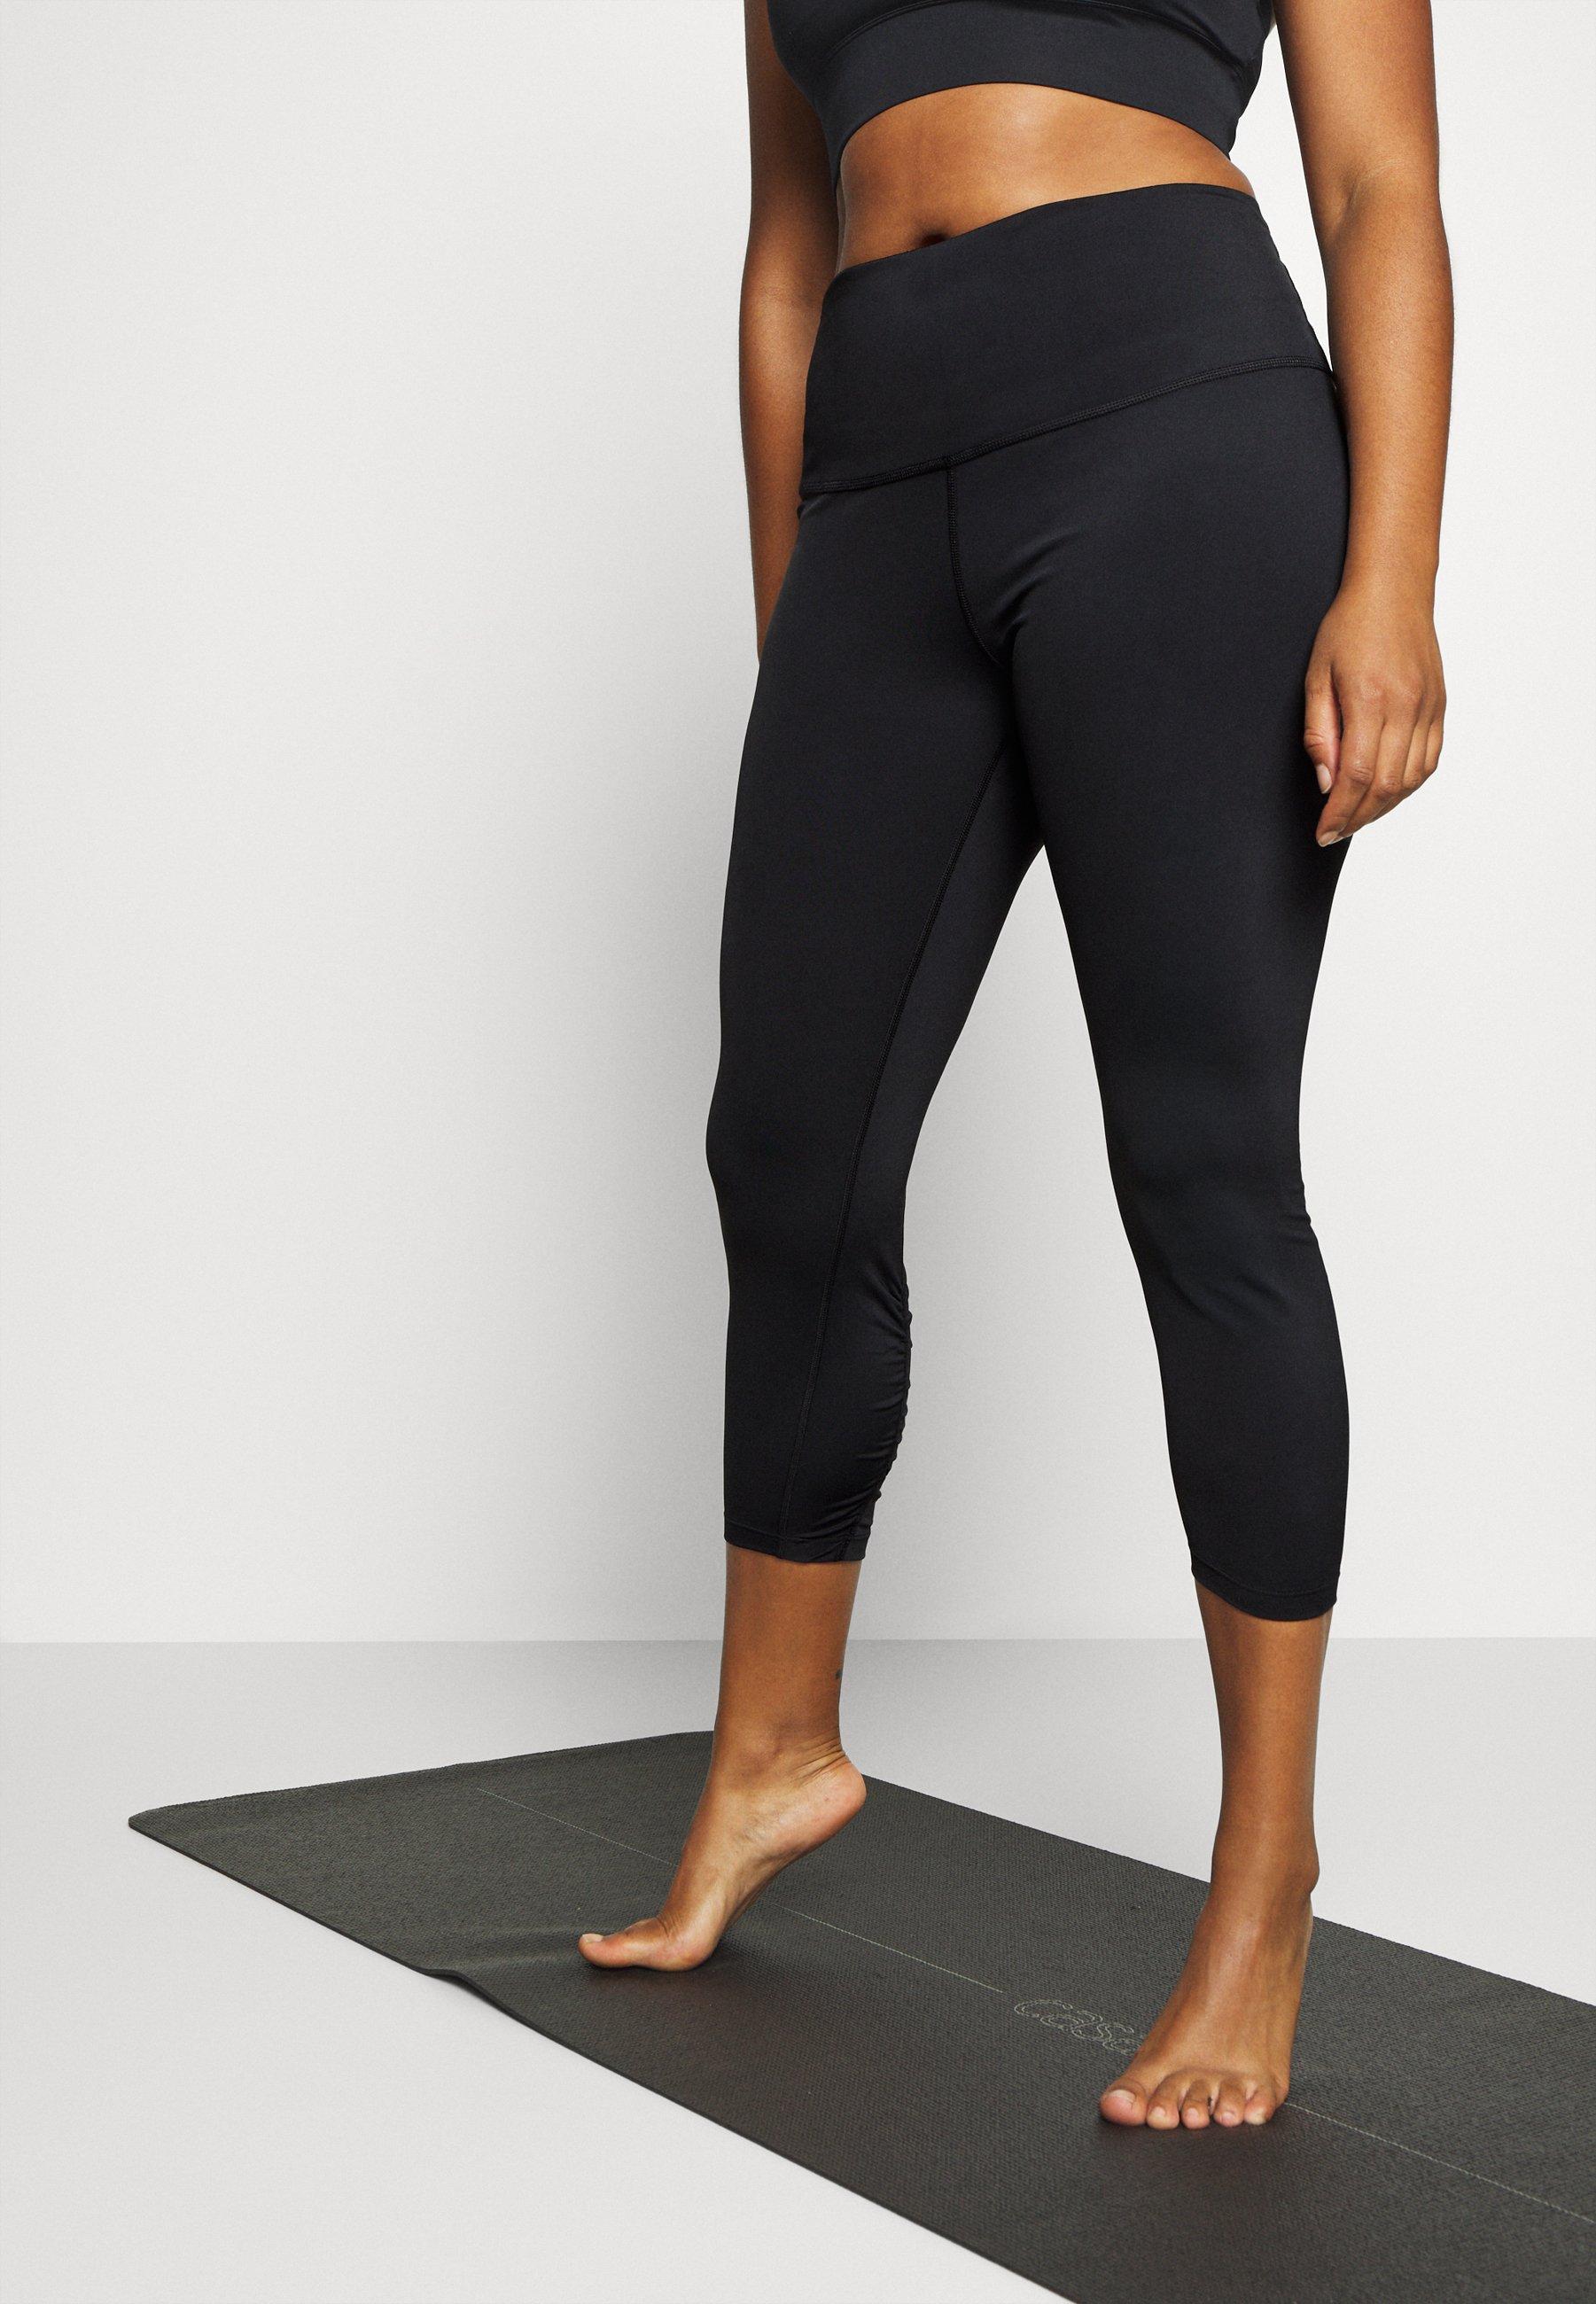 Femme YOGA RUCHE 7/8 TIGHT PLUS - Pantalon 3/4 de sport